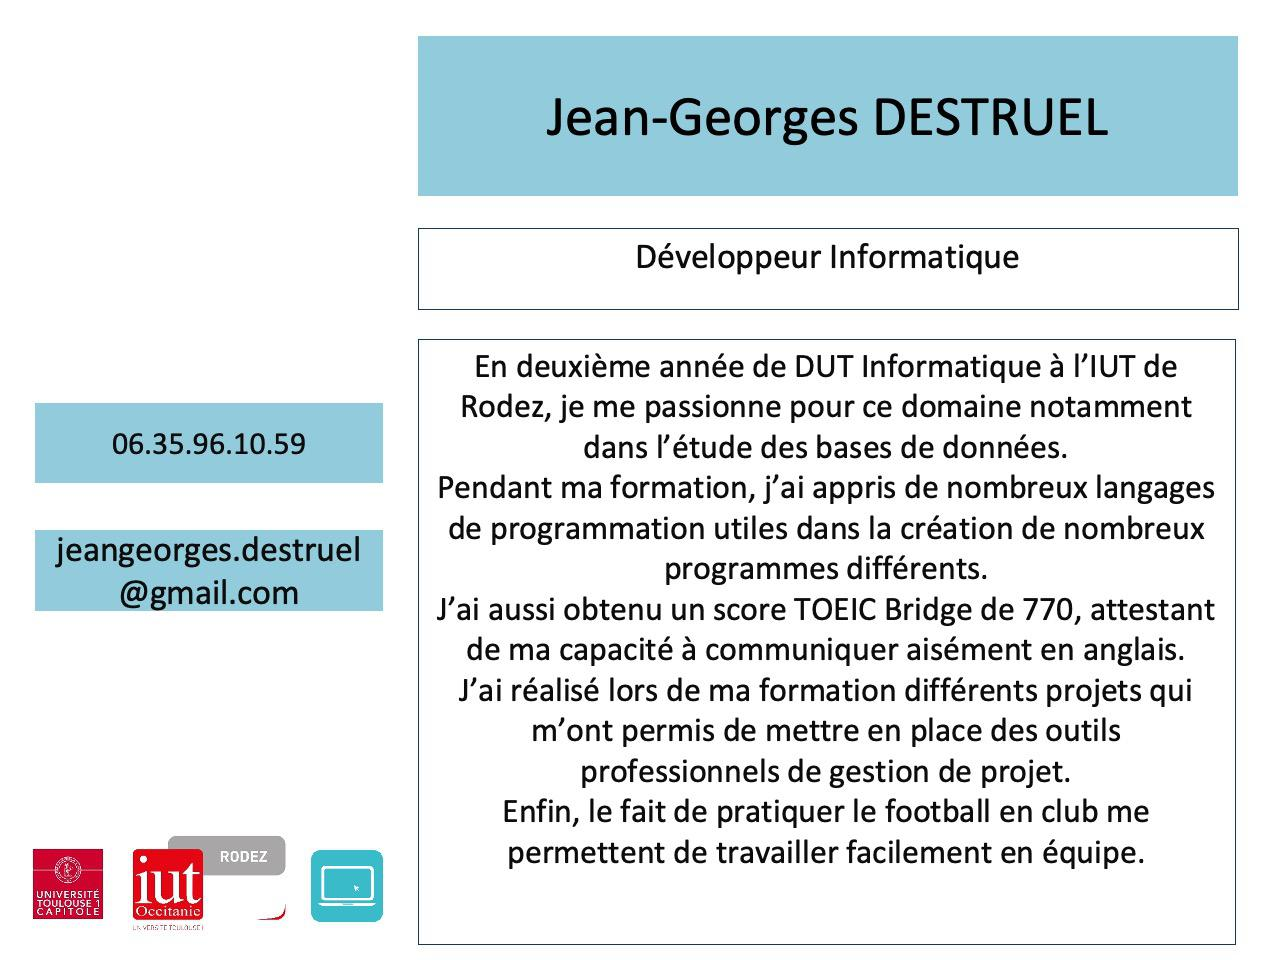 Jean-Georges Destruel